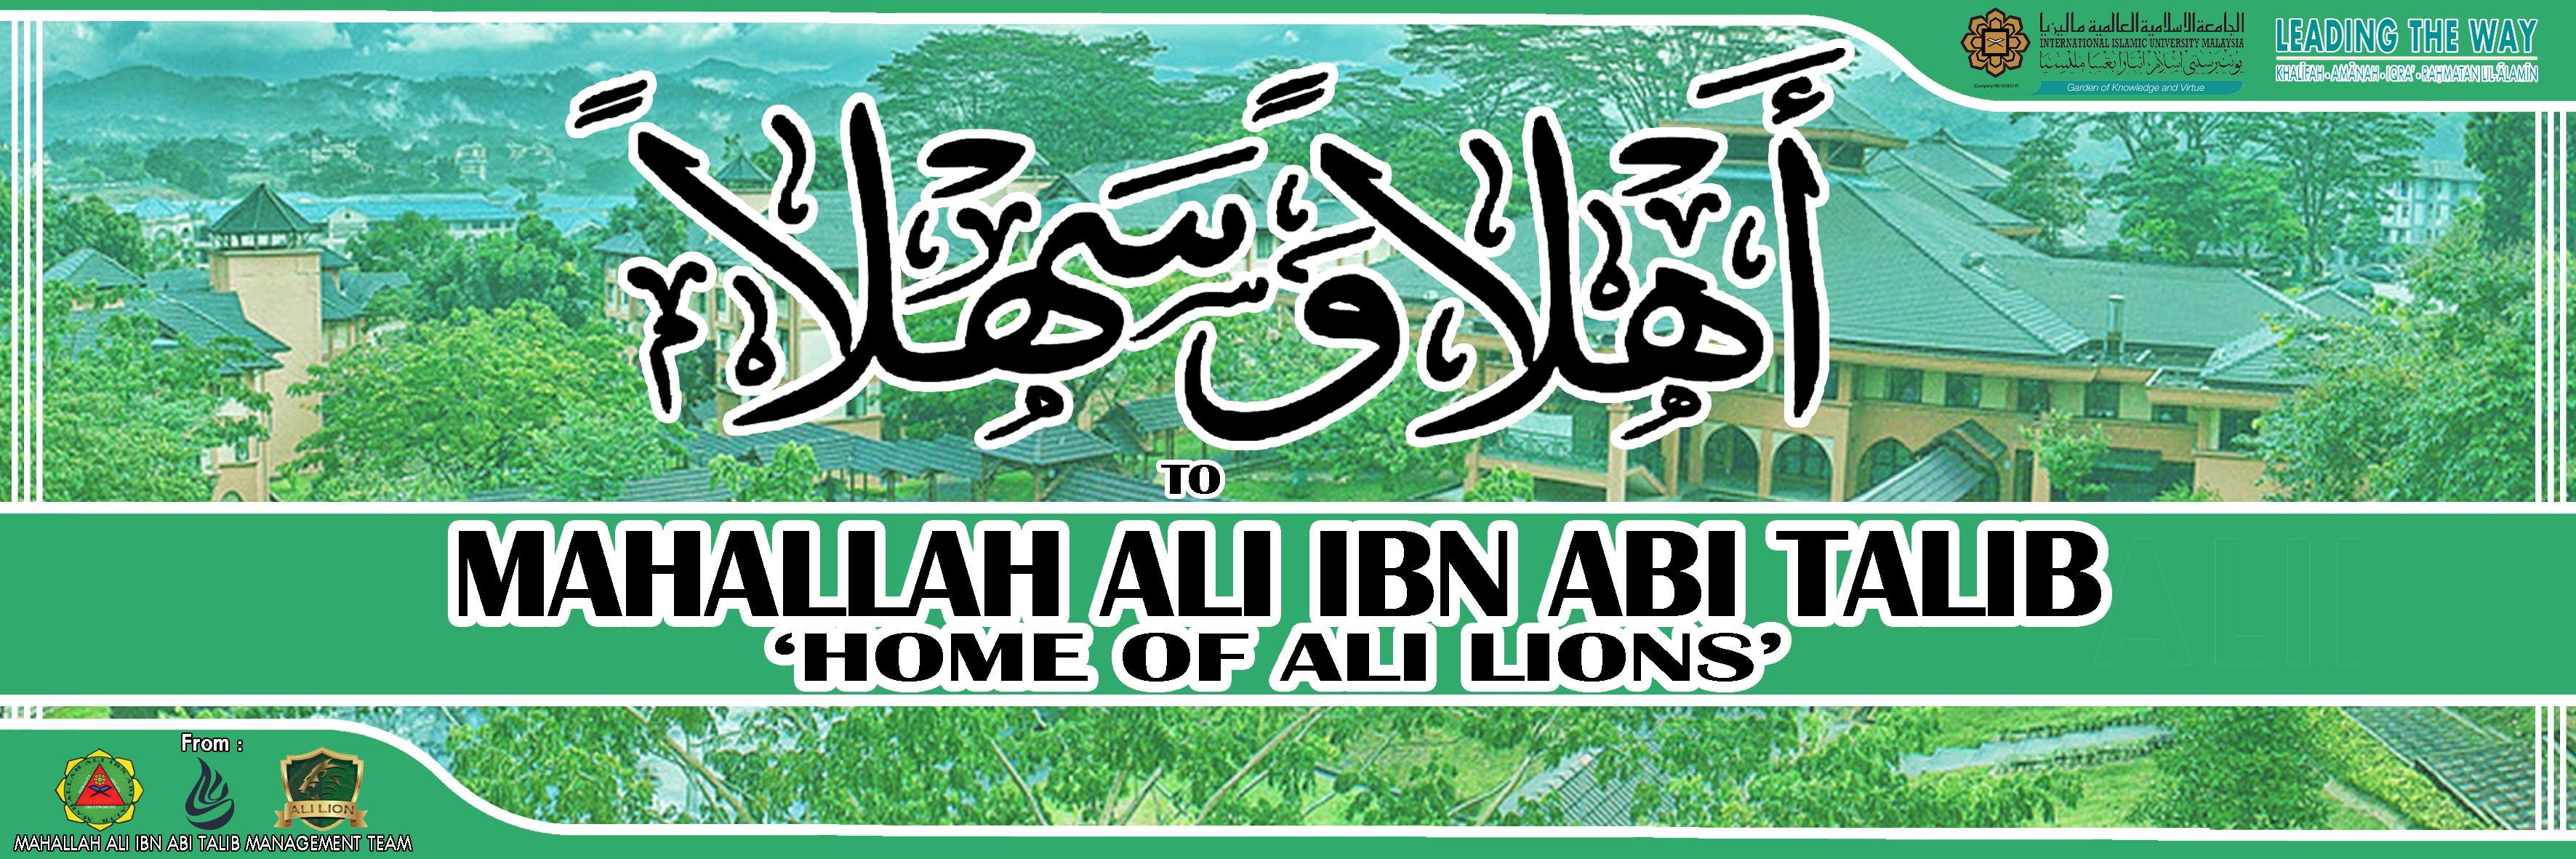 MAHALLAH ALI IBN ABI TALIB (RESIDENTIAL COLLEGE)